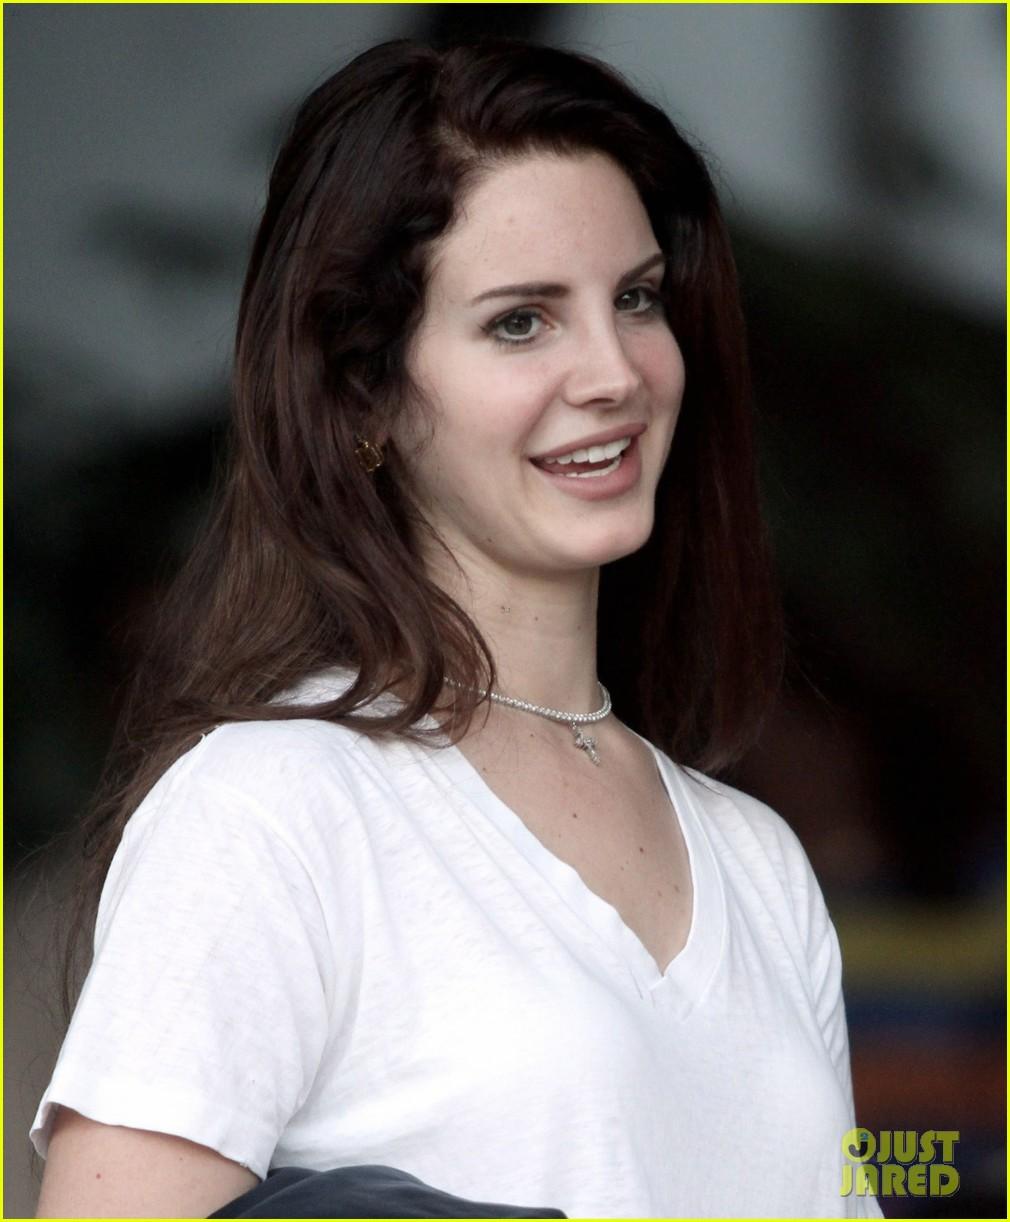 Lana Del Rey Saturday Smiles Photo 2697153 Lana Del Rey Pictures Just Jared